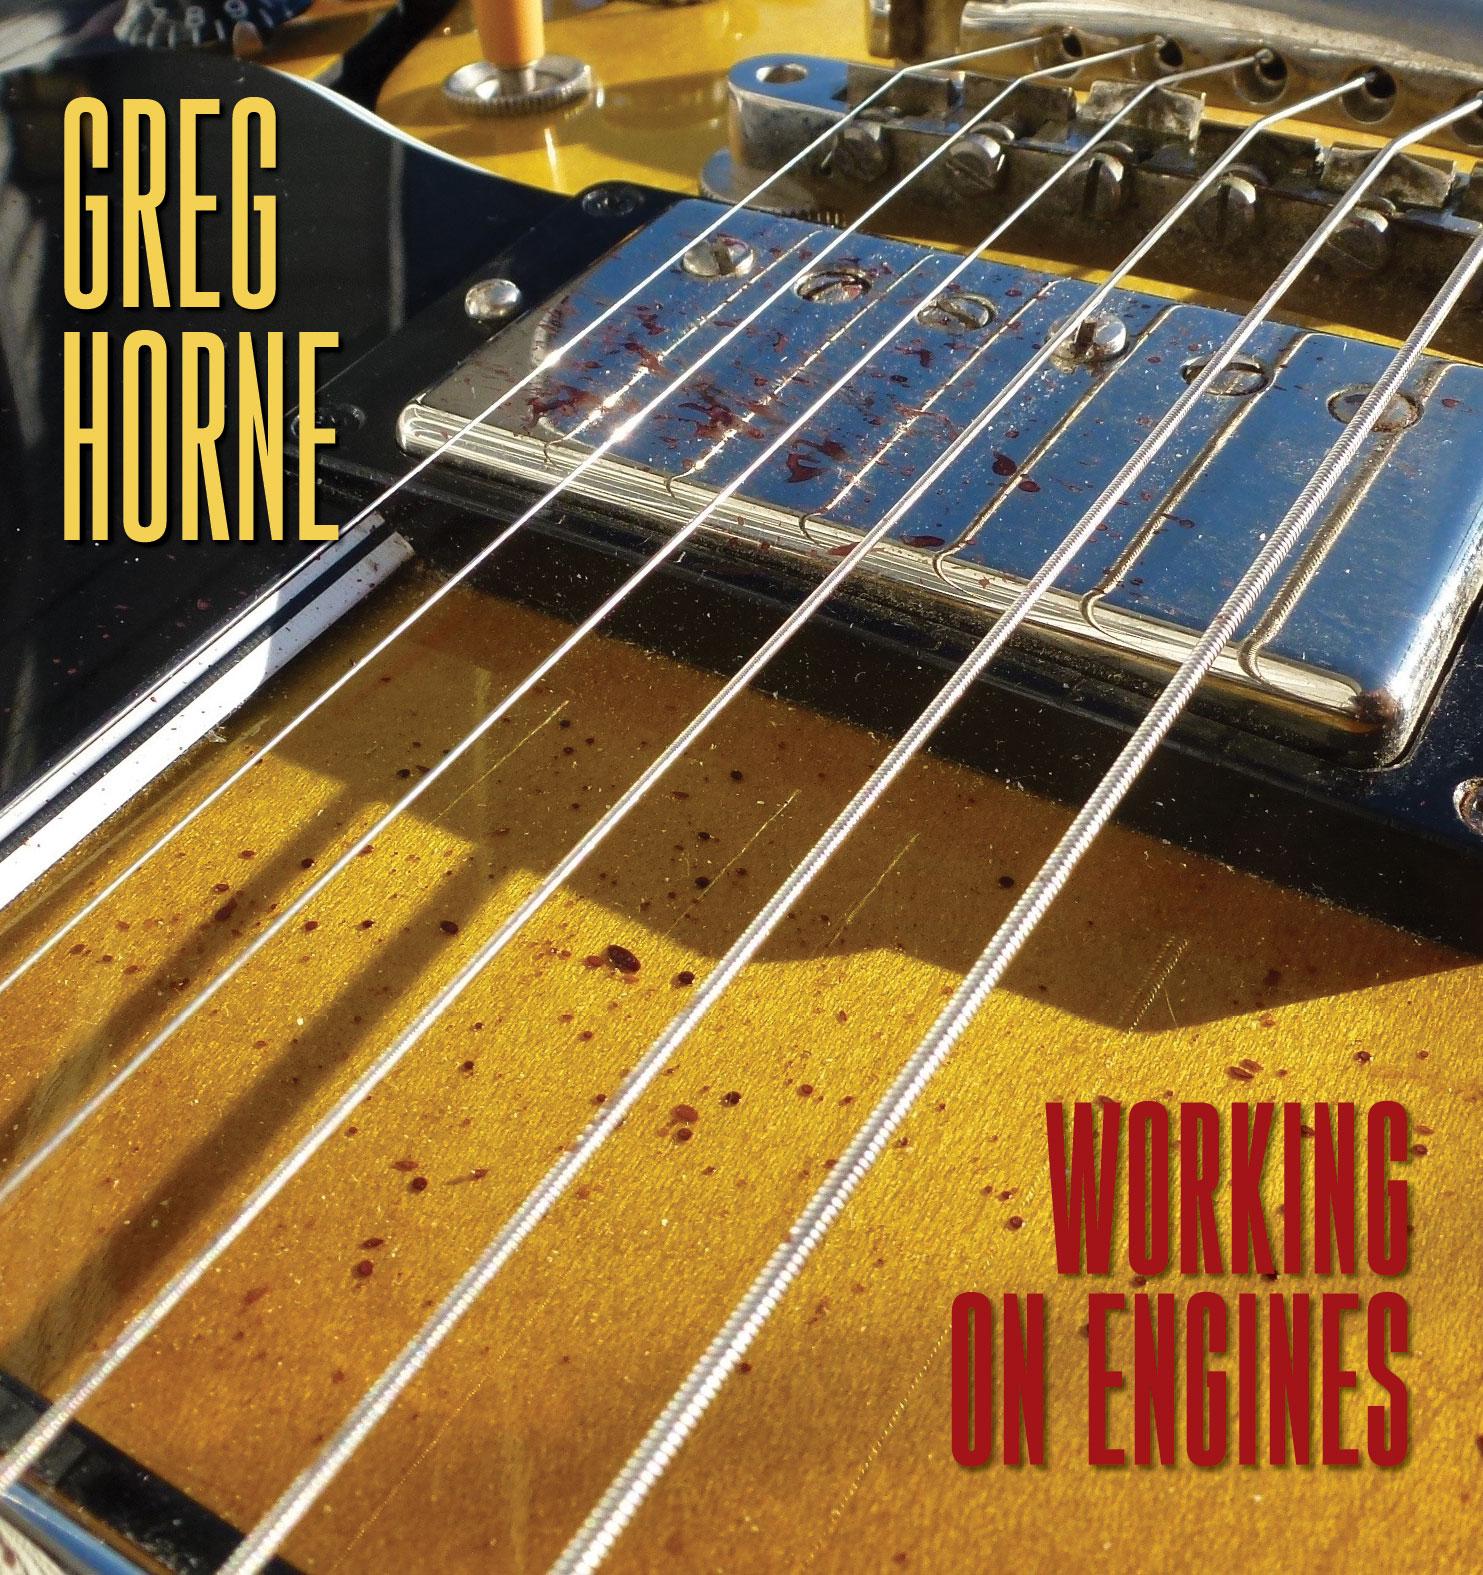 GregHorne_WorkingOnEngines